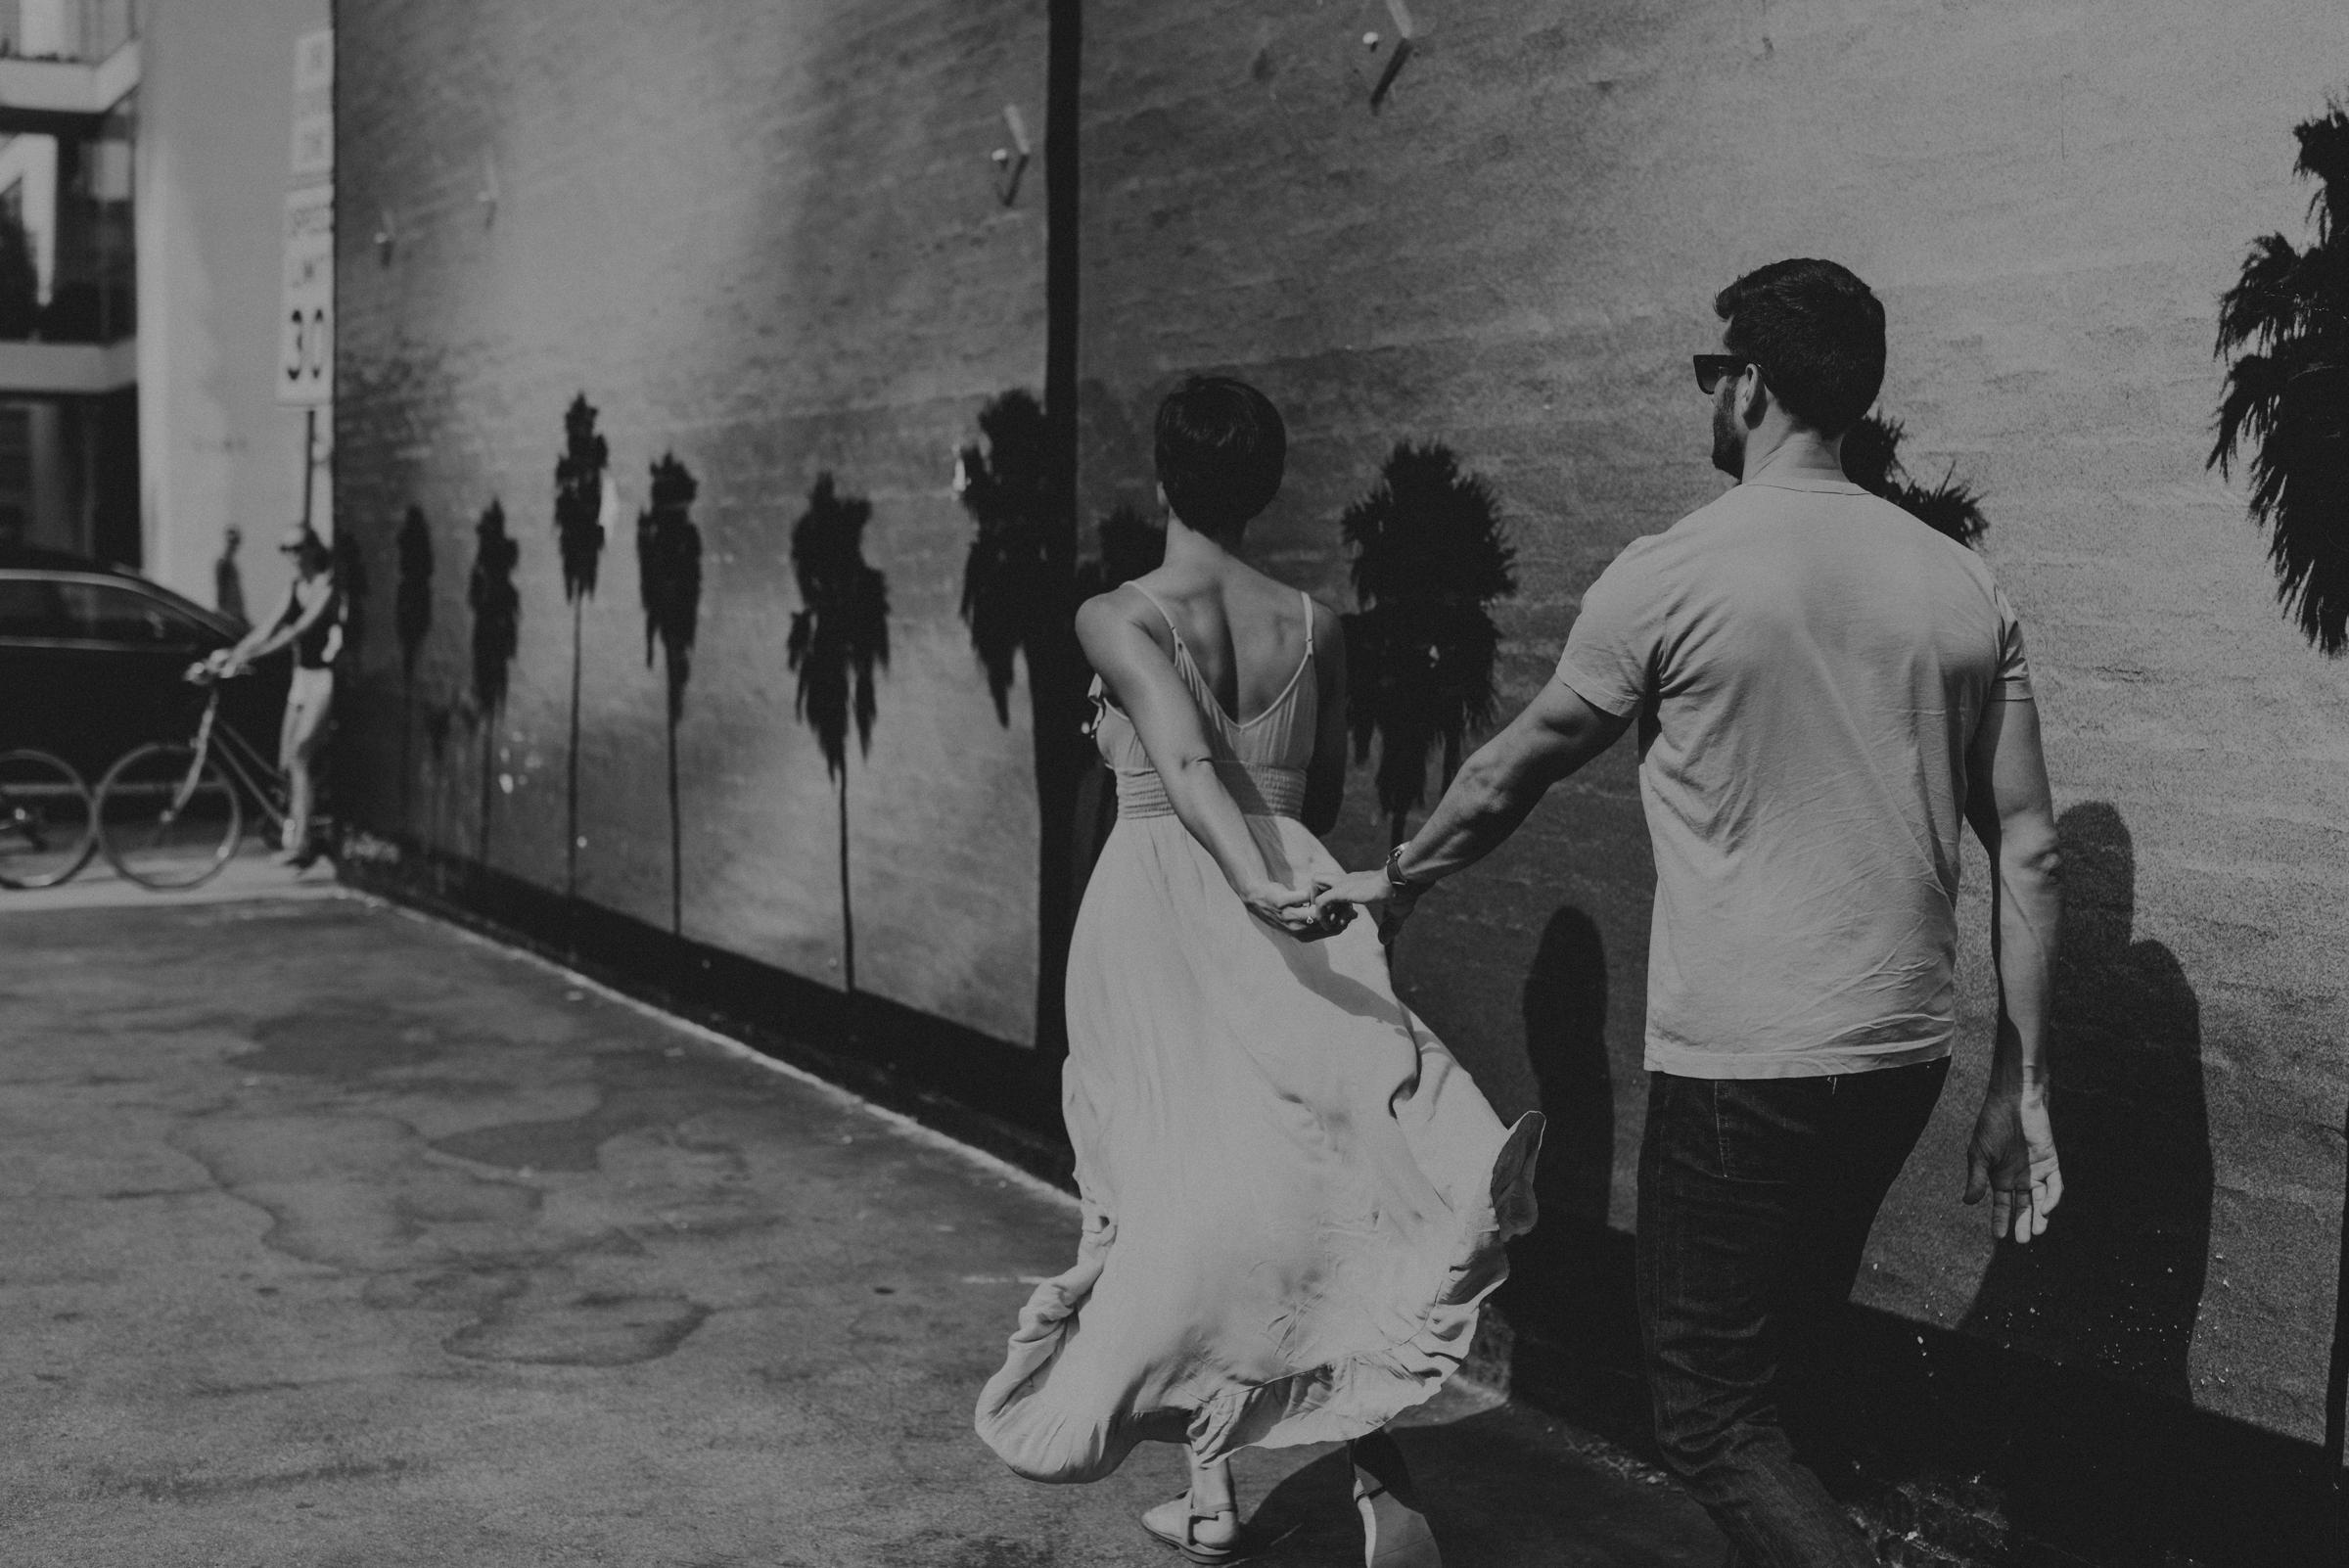 Isaiah + Taylor Photography - Venice Beach & Santa Monica Engagement Session, Los Angeles Wedding Photographer-032.jpg